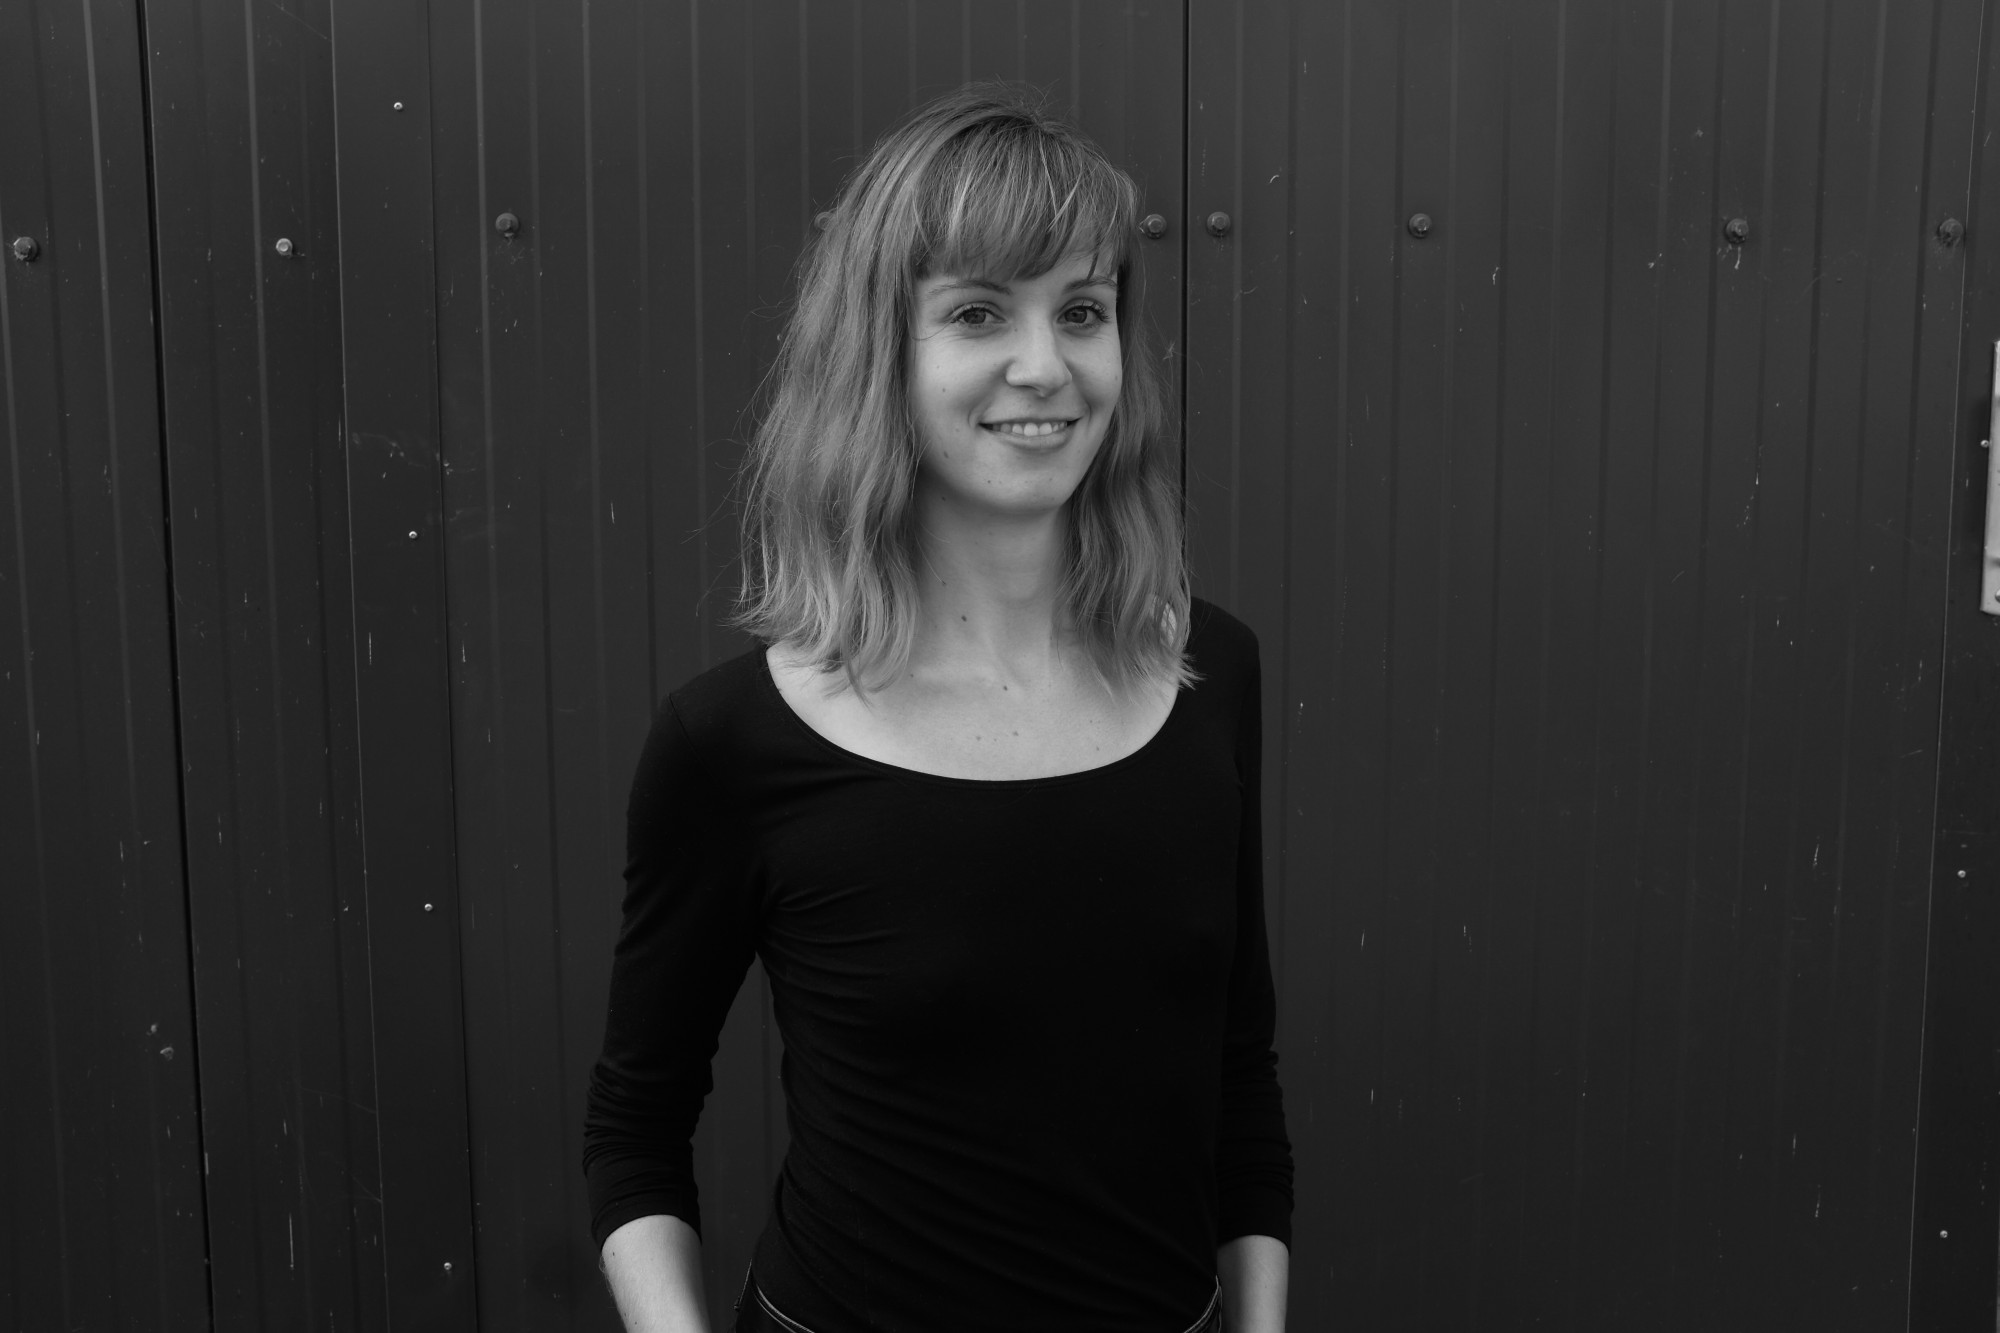 Marie Le Meledo, bâtisseuse d'avenir